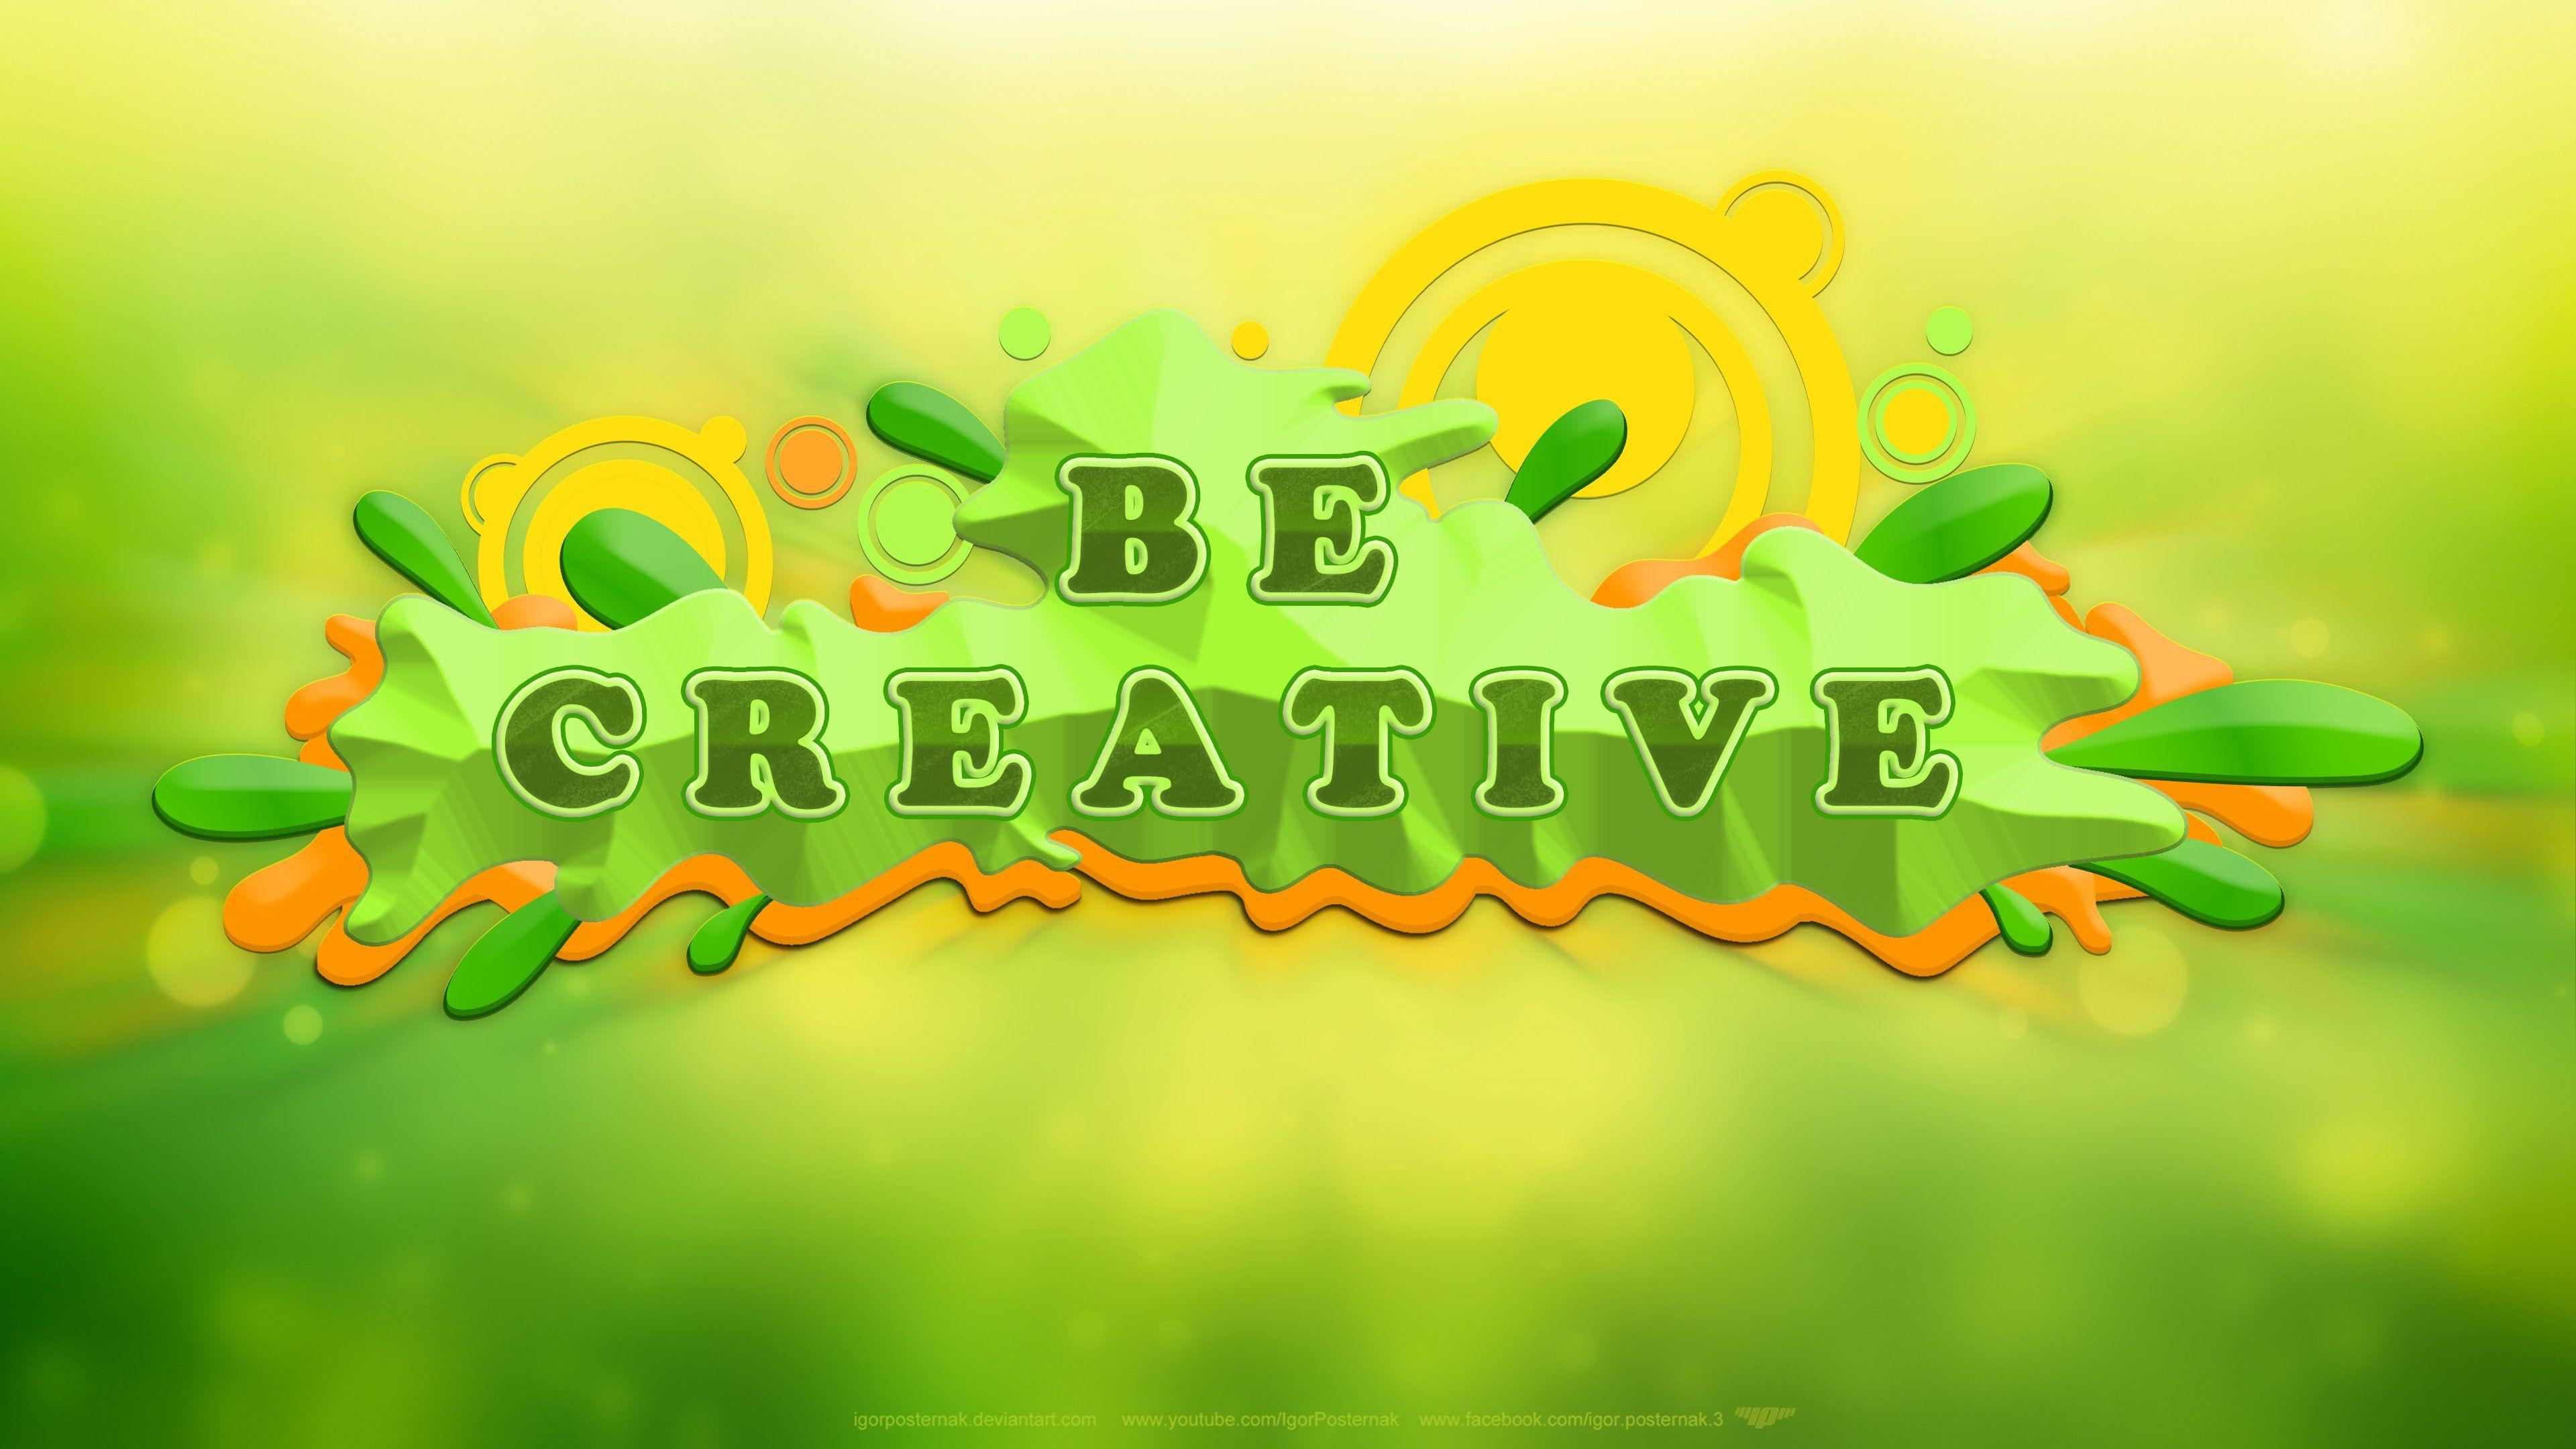 Creative Tree Circle Render Digital Art HD Wallpaper